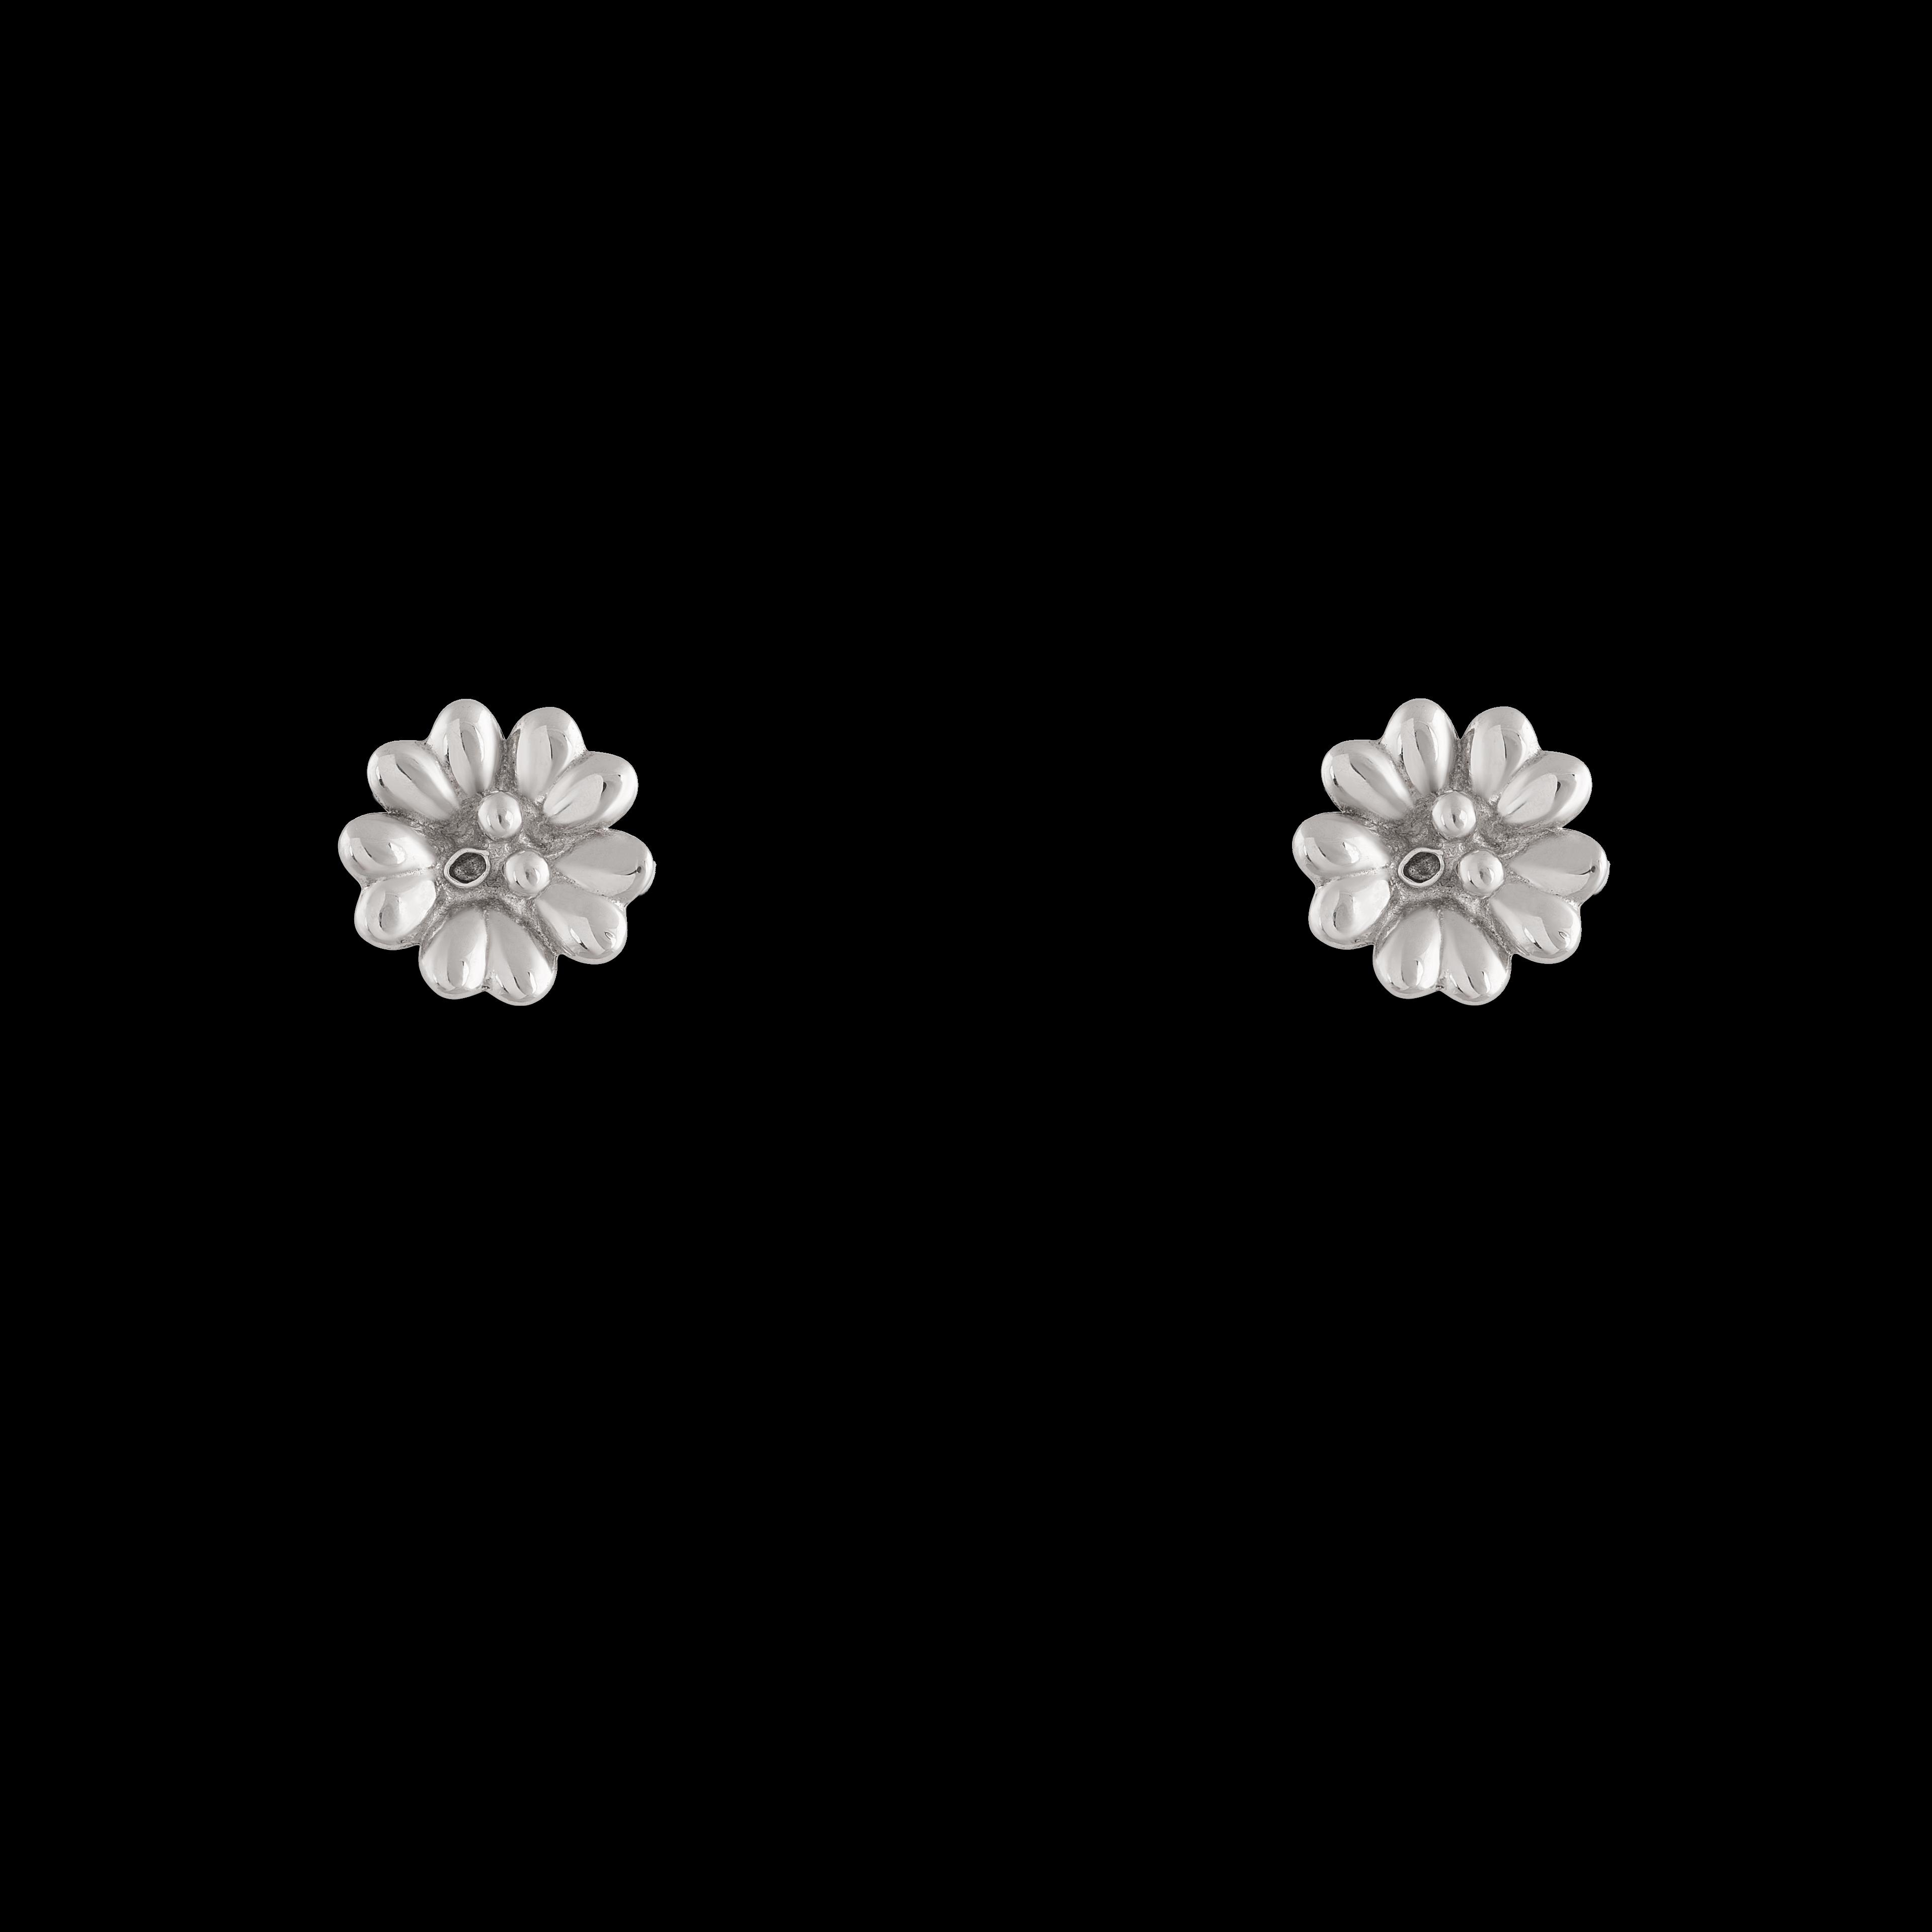 گوشواره نقره گل